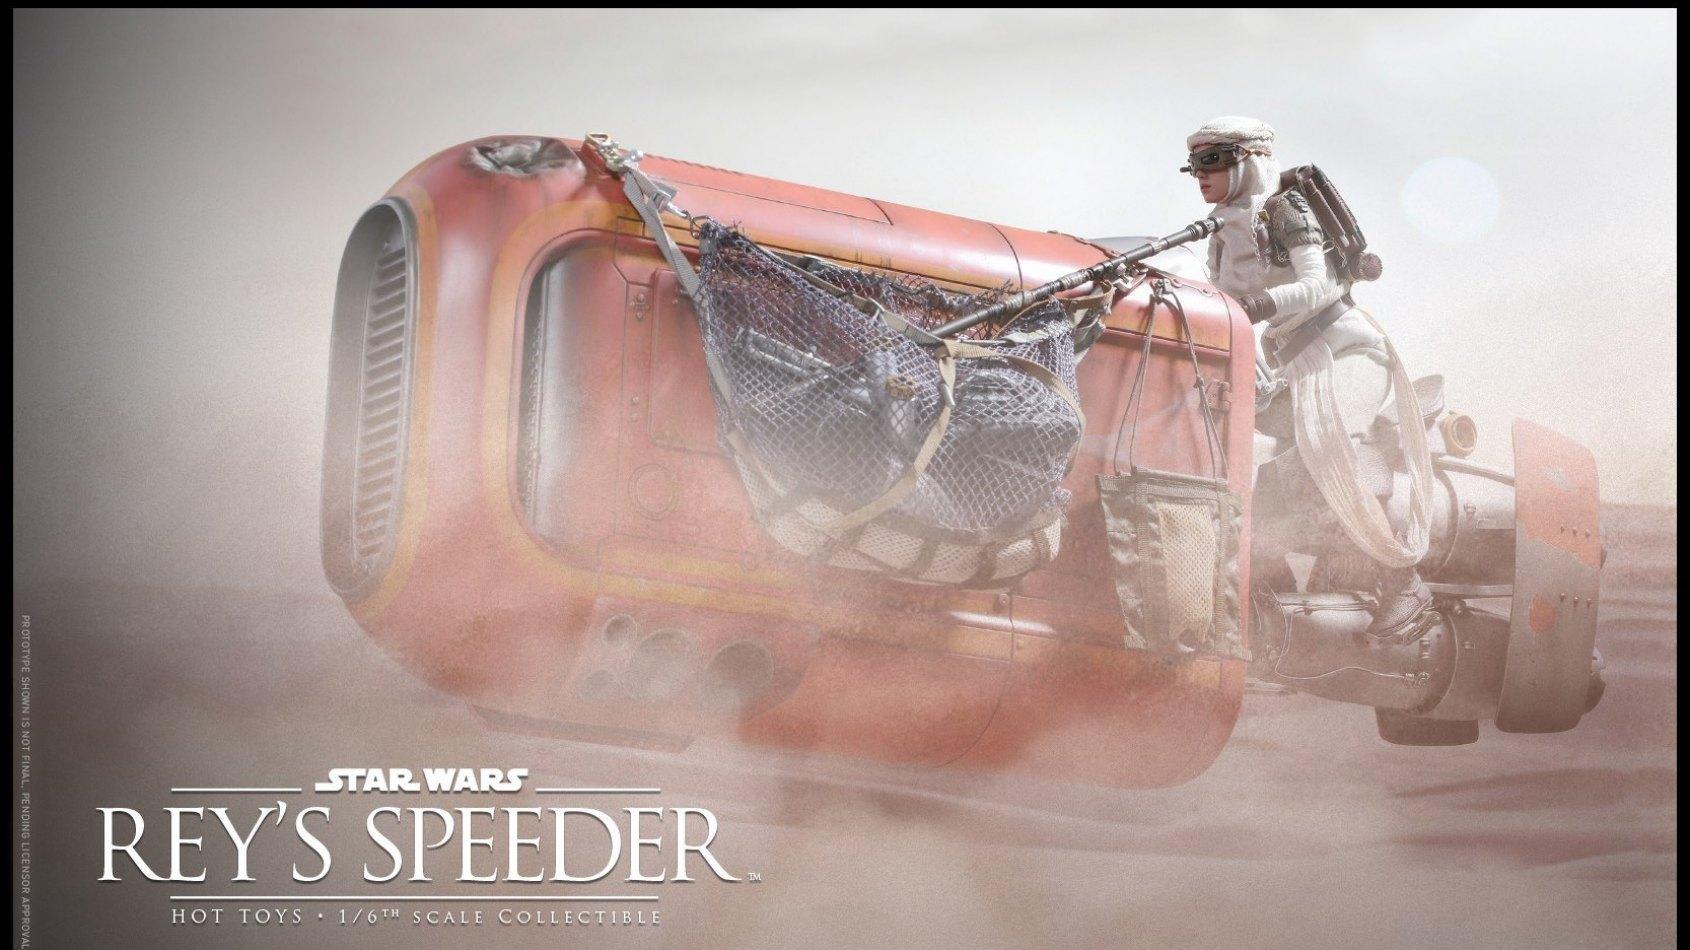 Hot Toys: figurine de Rey pilleuse d'épaves et speeder